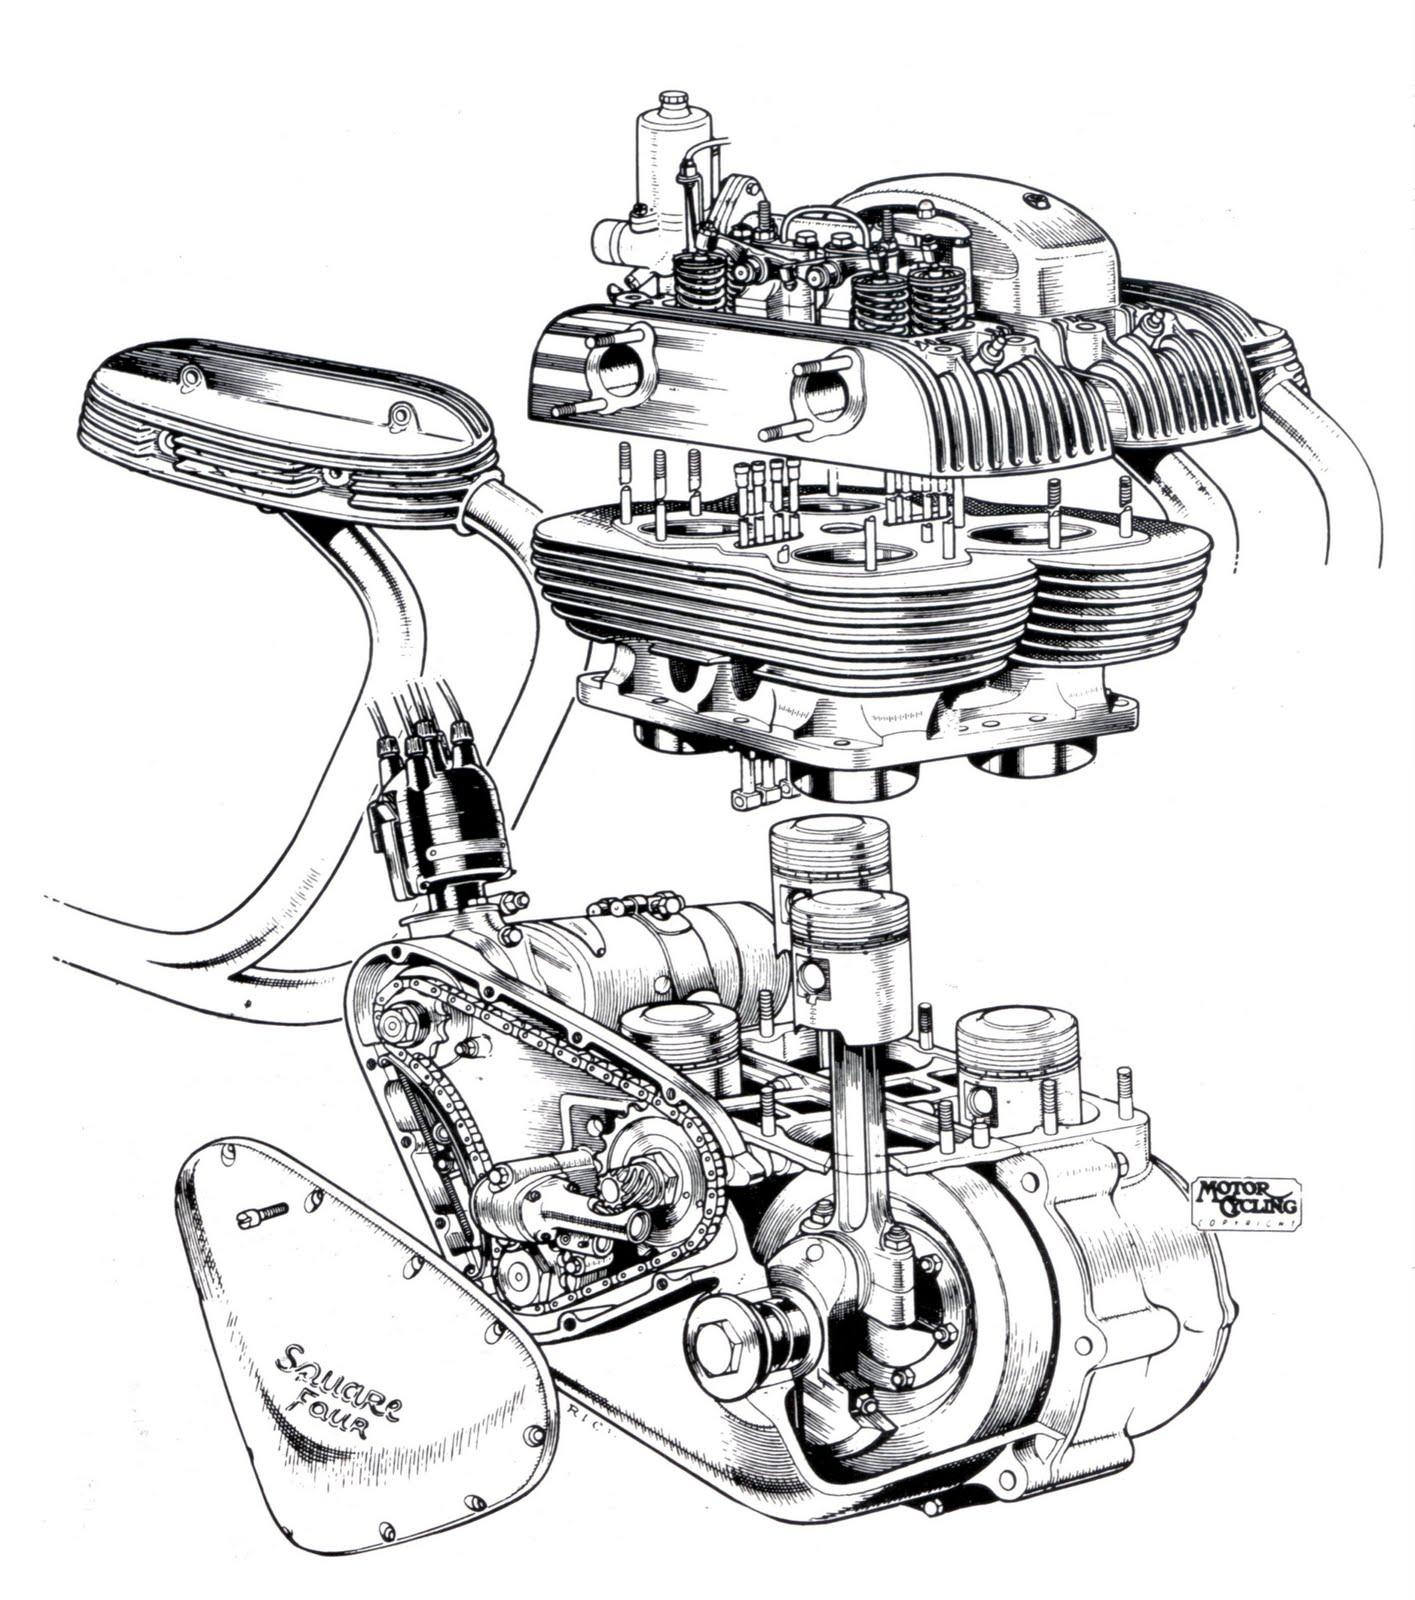 Ariel Square Four Engine